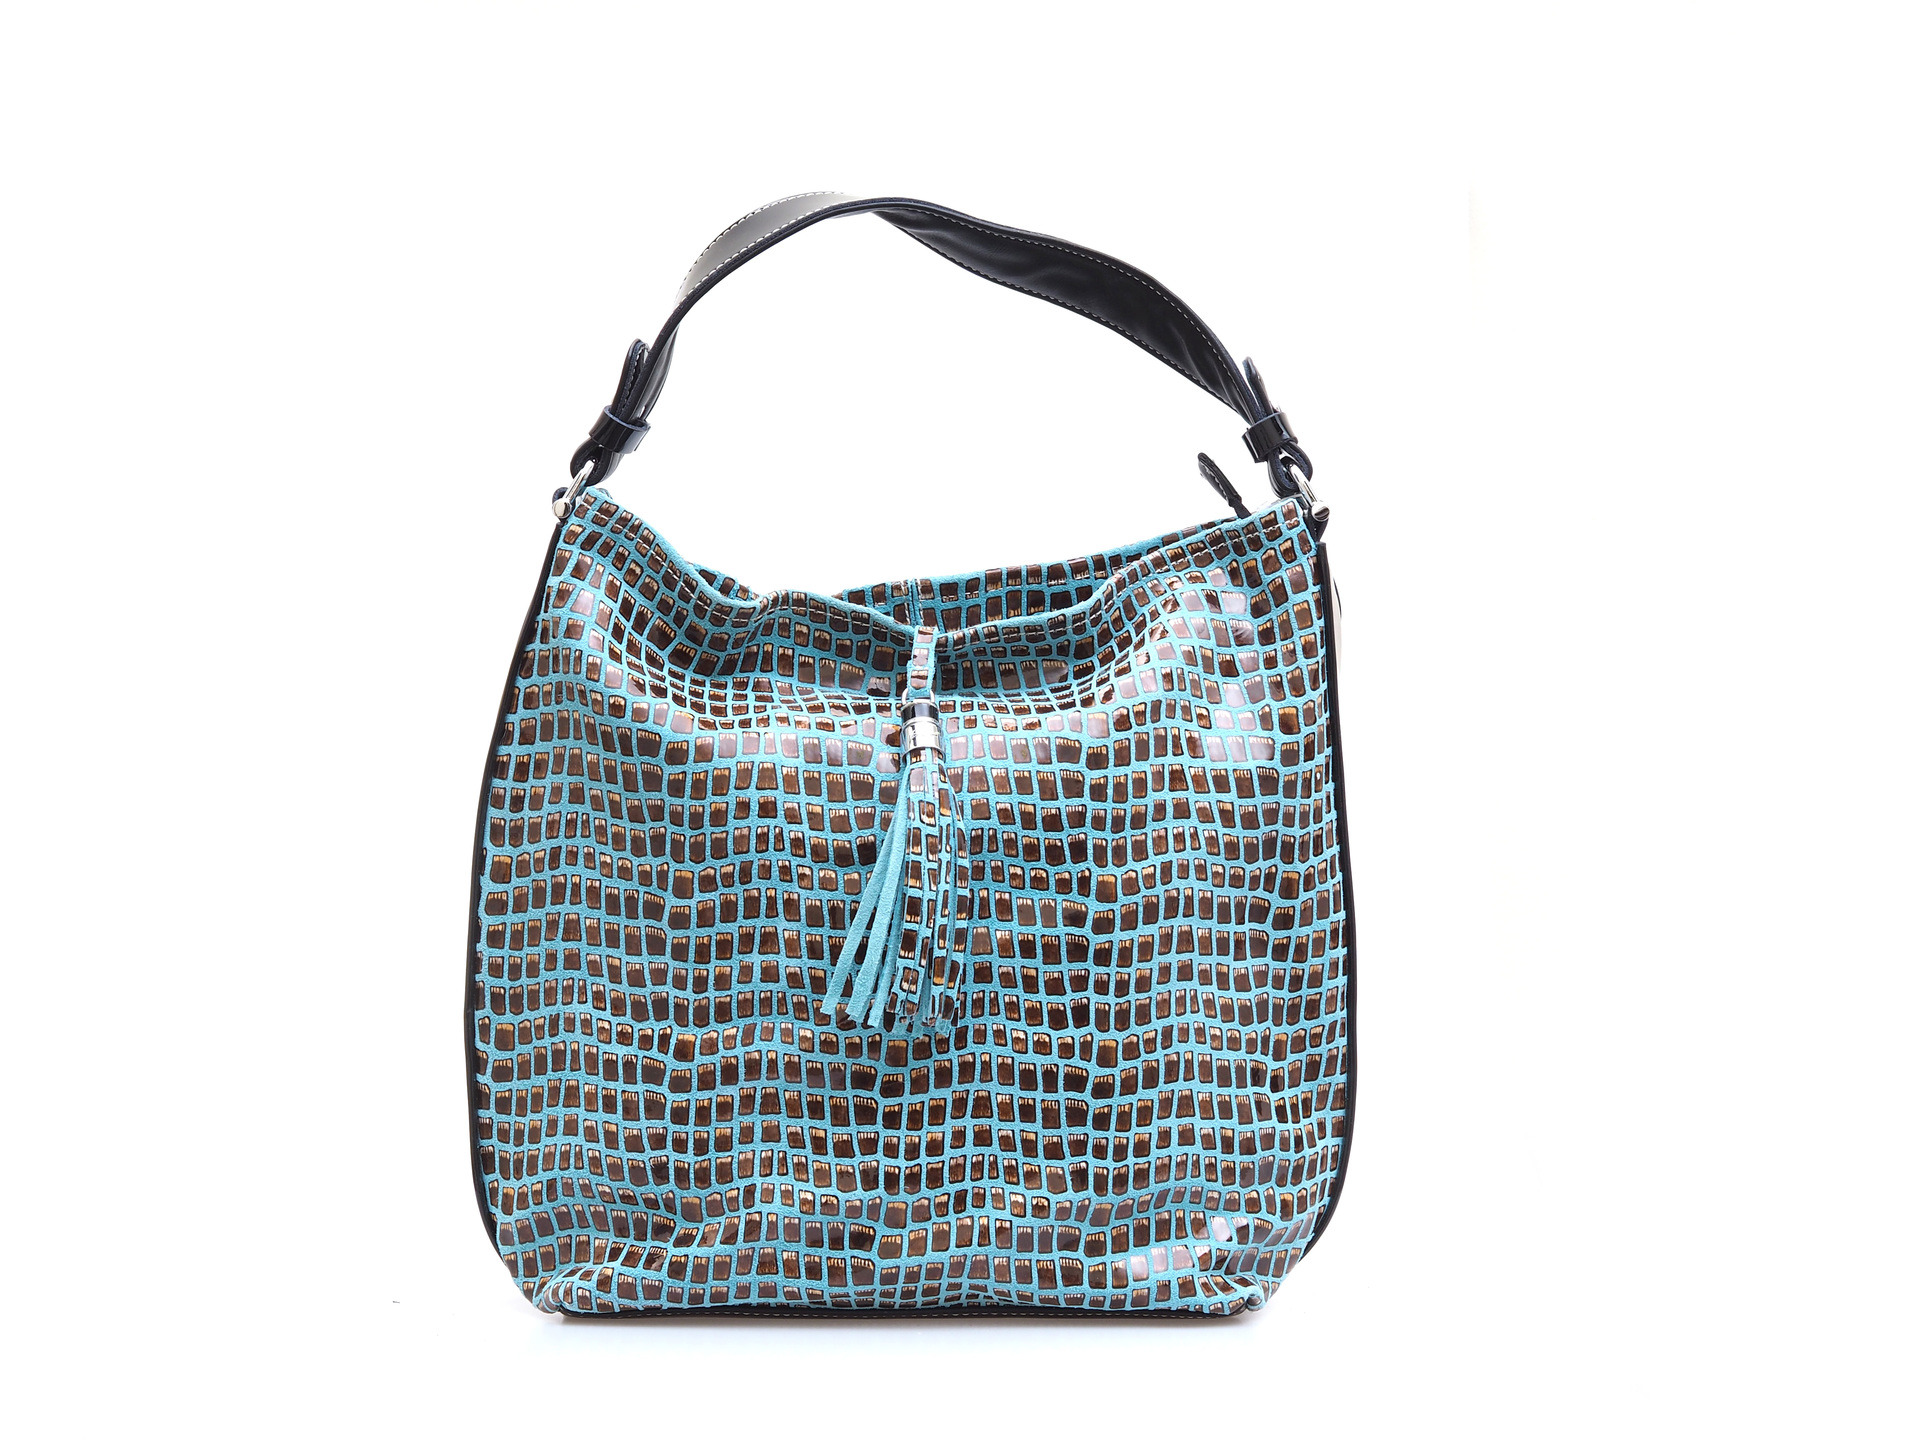 Soňa - Dámska - Dámske kabelky - Modrá dámska kabelka cez plece 483c16e7926